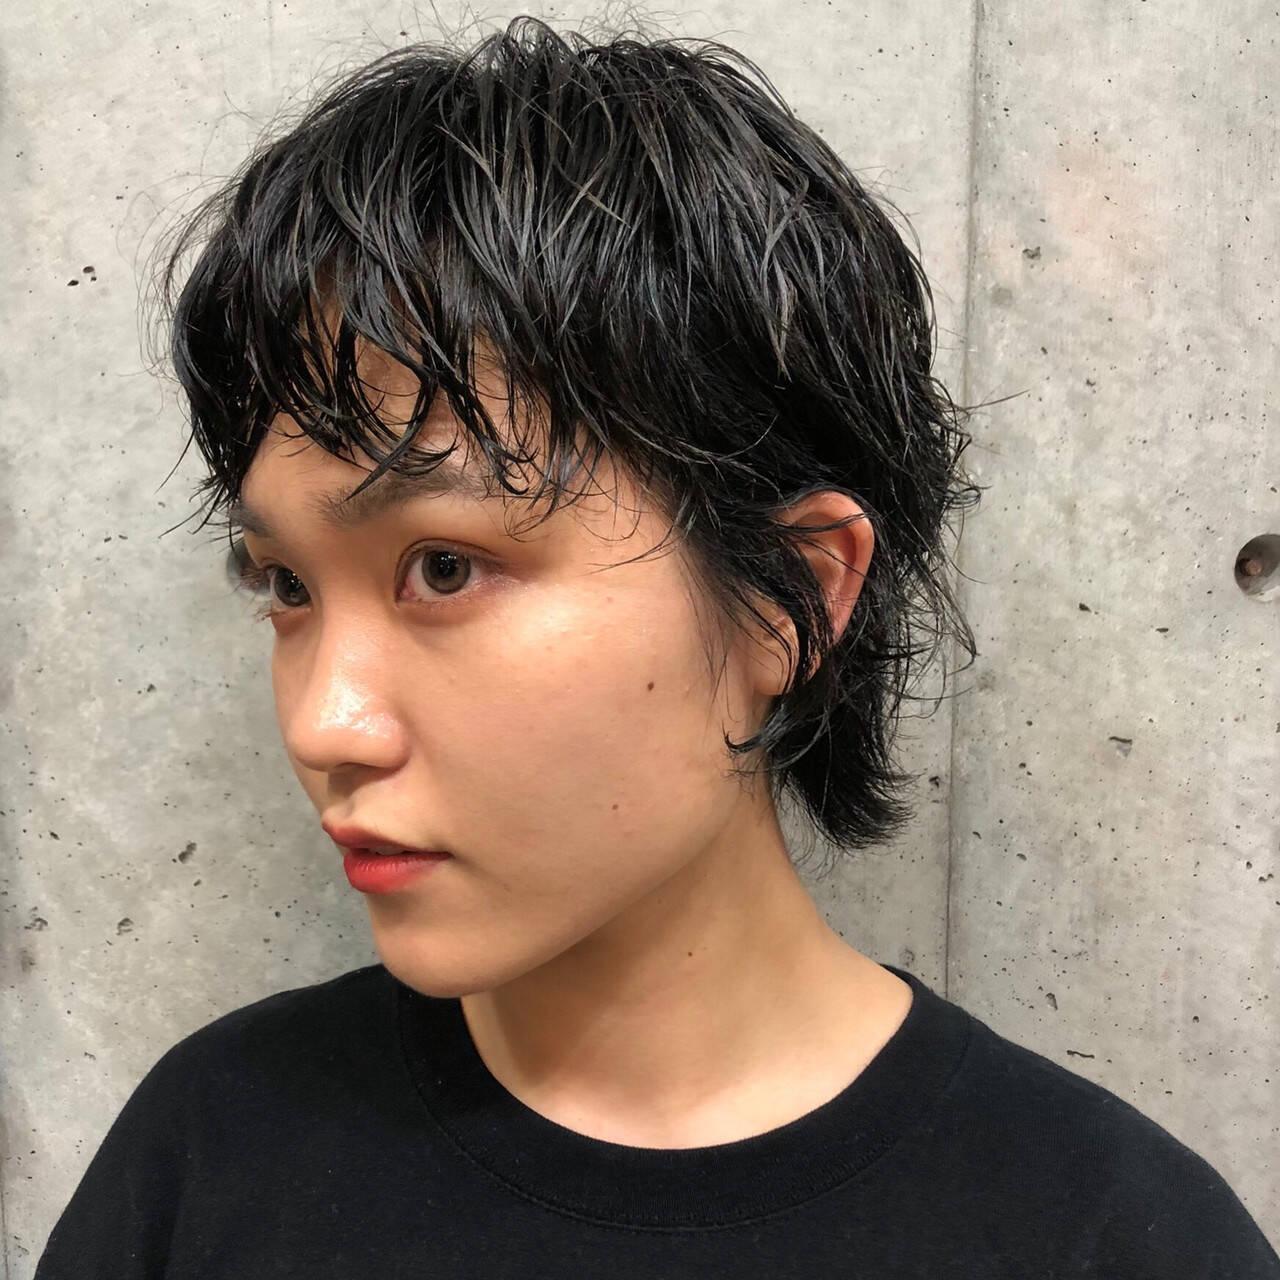 MIKIZO/SILEM(シーレム)